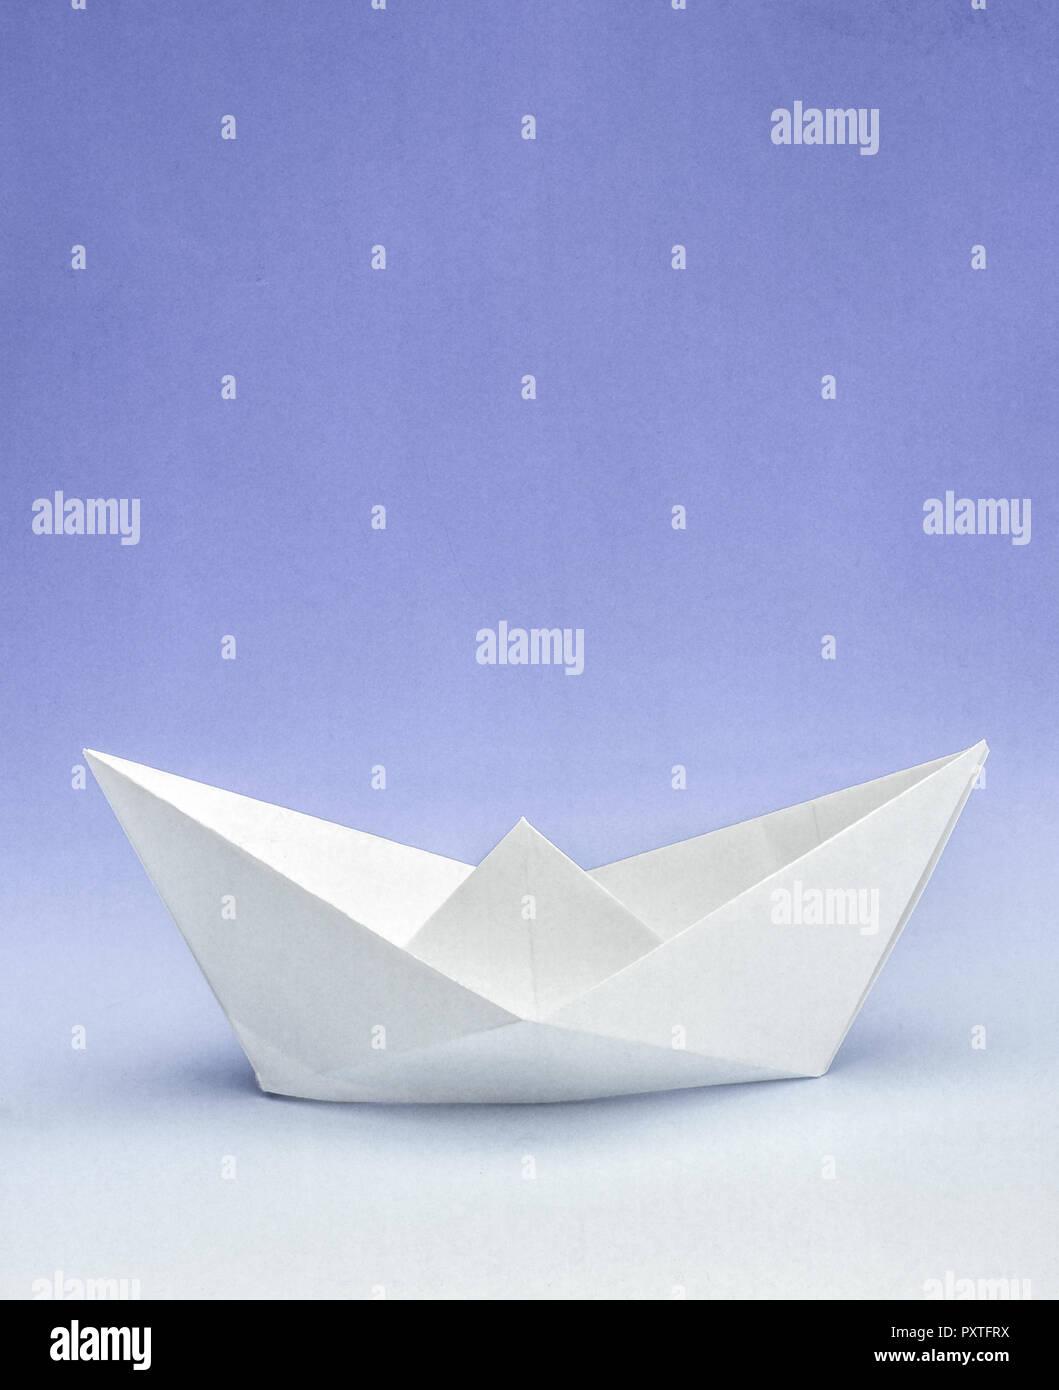 Origami Crimp Fold   1390x1060